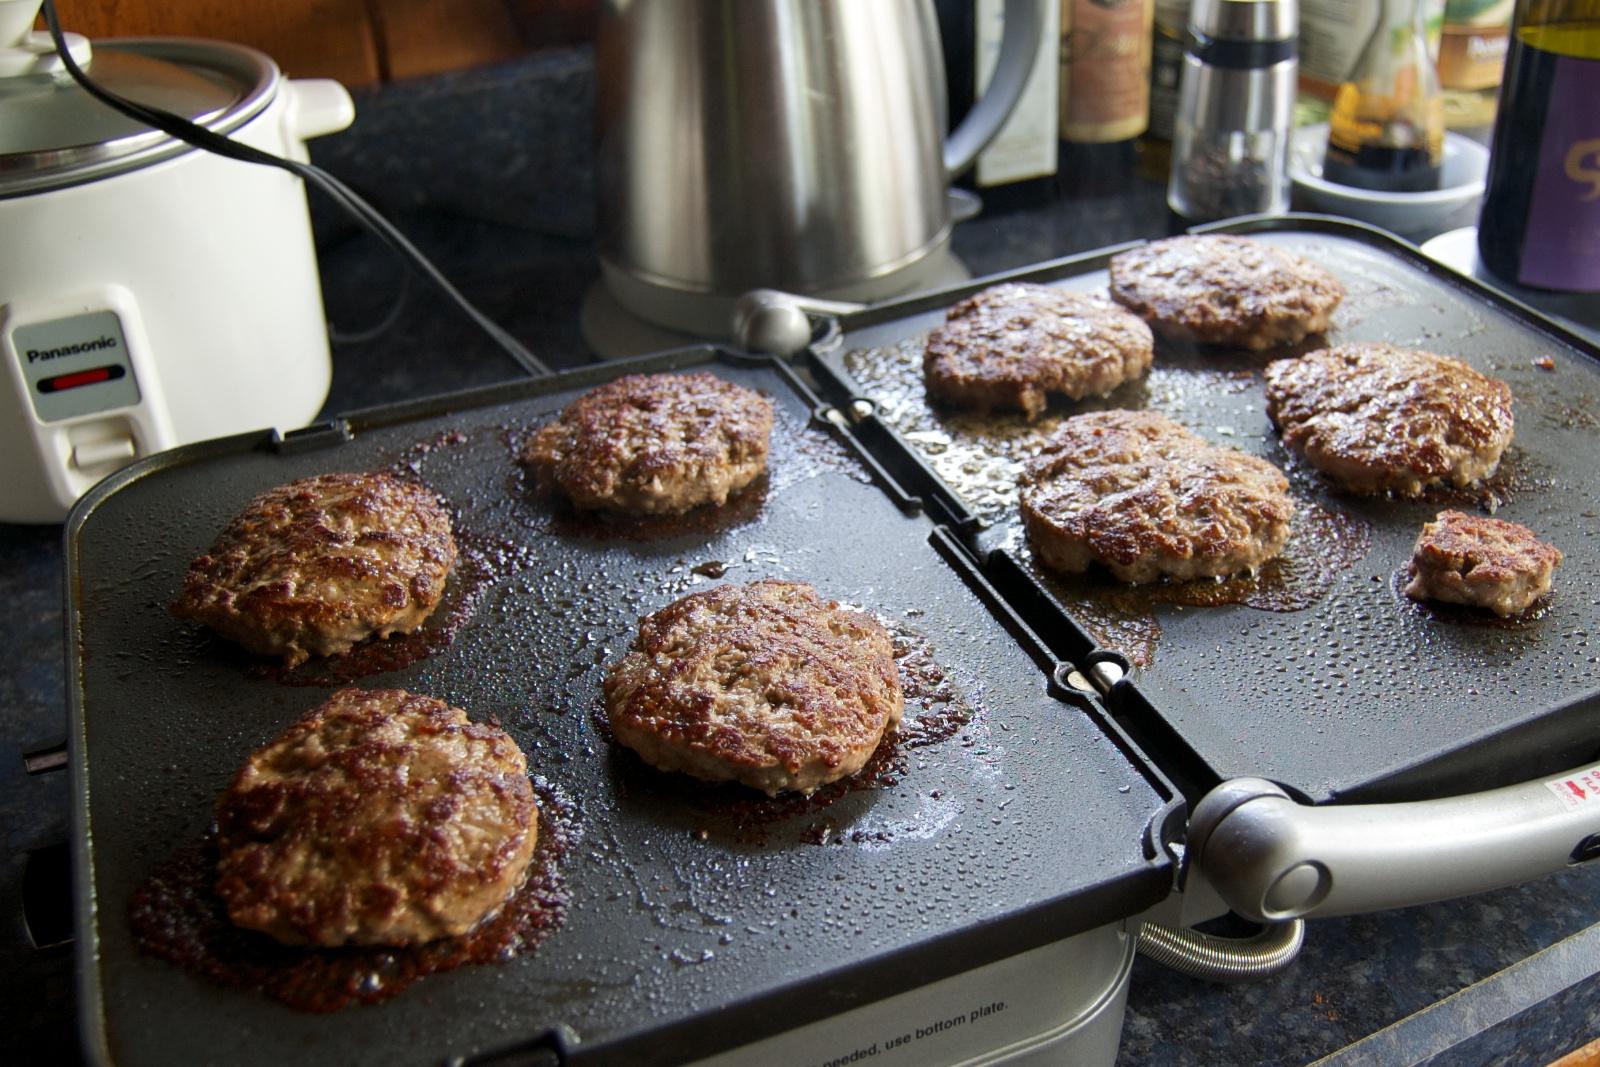 http://blog.rickk.com/food/2011/08/16/sausage3.jpg